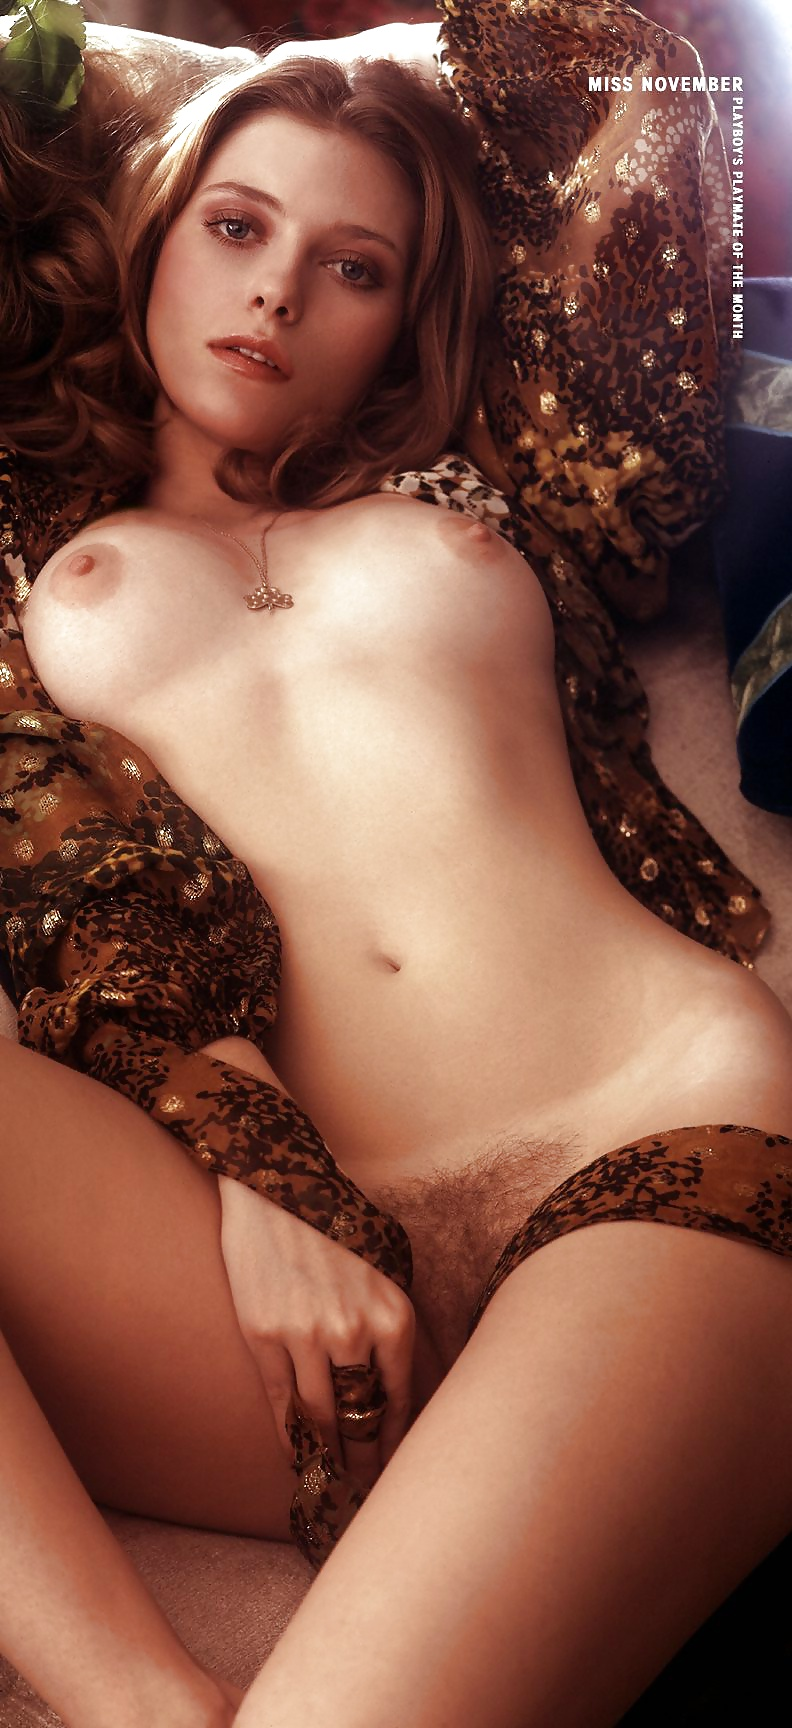 Playmate Playboy